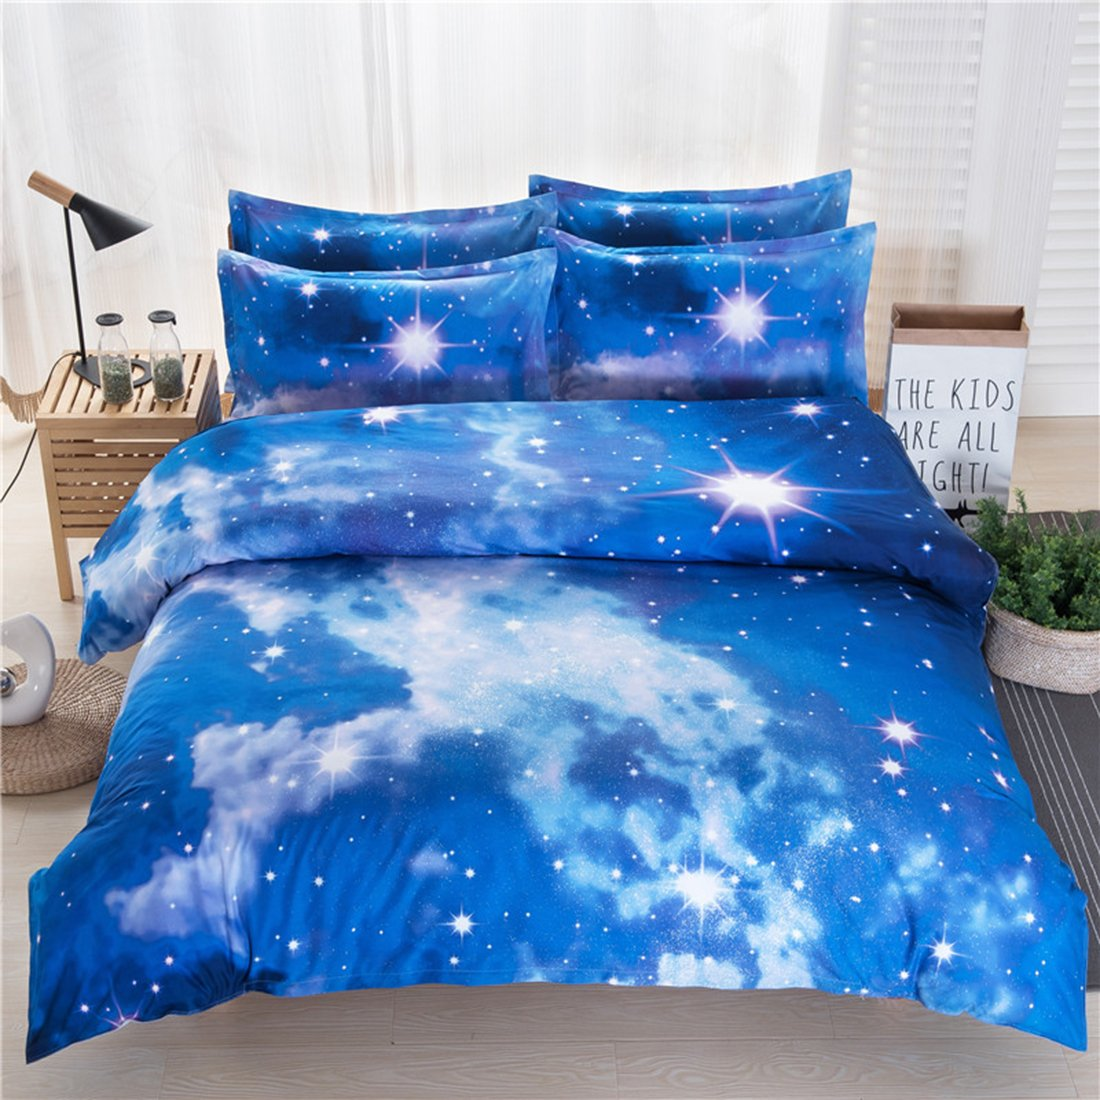 Vinmax Galaxy 3D Bedding Sets 4pc Mysterious Sky Night Bedding Sheet Sets, Duvet Cover, Flat Sheet, 2 Pillowcase (no Comforter inside) (A, 78.7490.55 in)